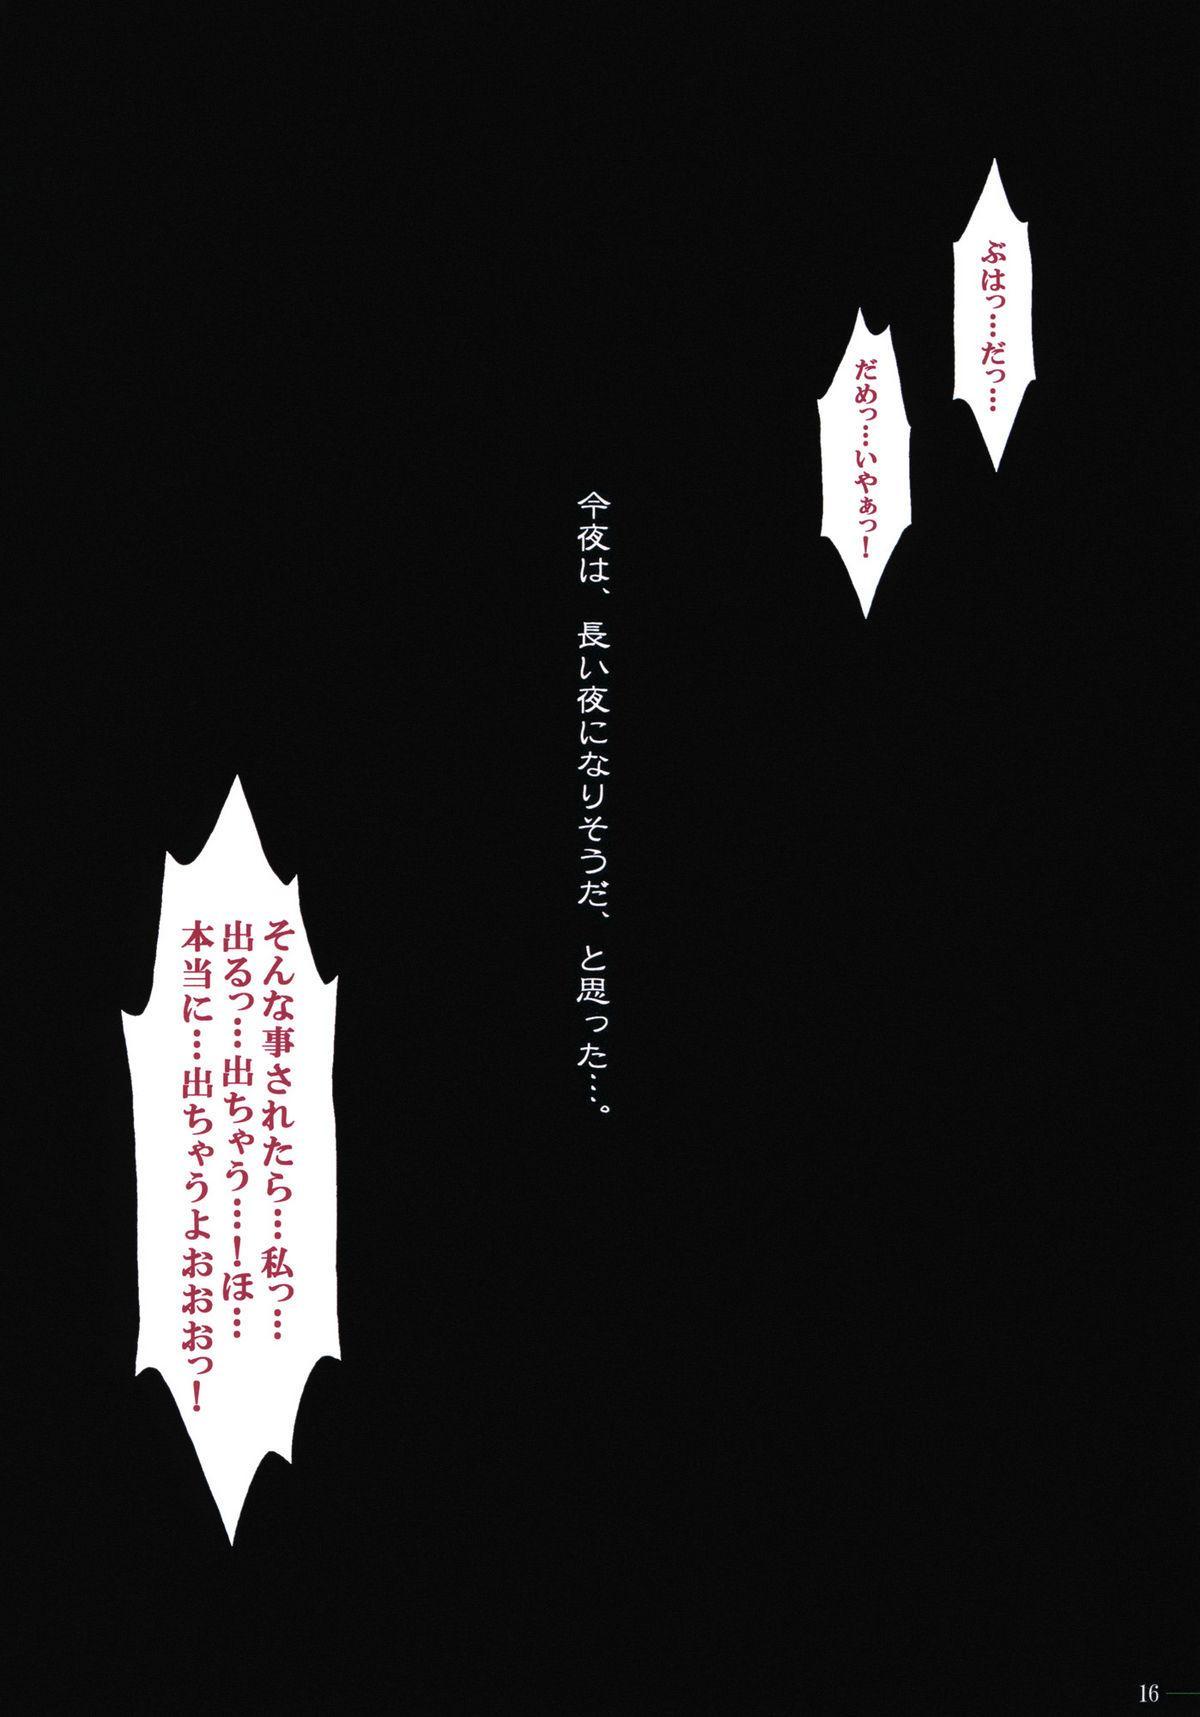 (C77) [Makino Jimusho (Taki Minashika)] LOVERS ~Koi ni Ochitara... ~Blindo LOVERS ~she is everything I need she is everything I'm not~ SIDE:A 14